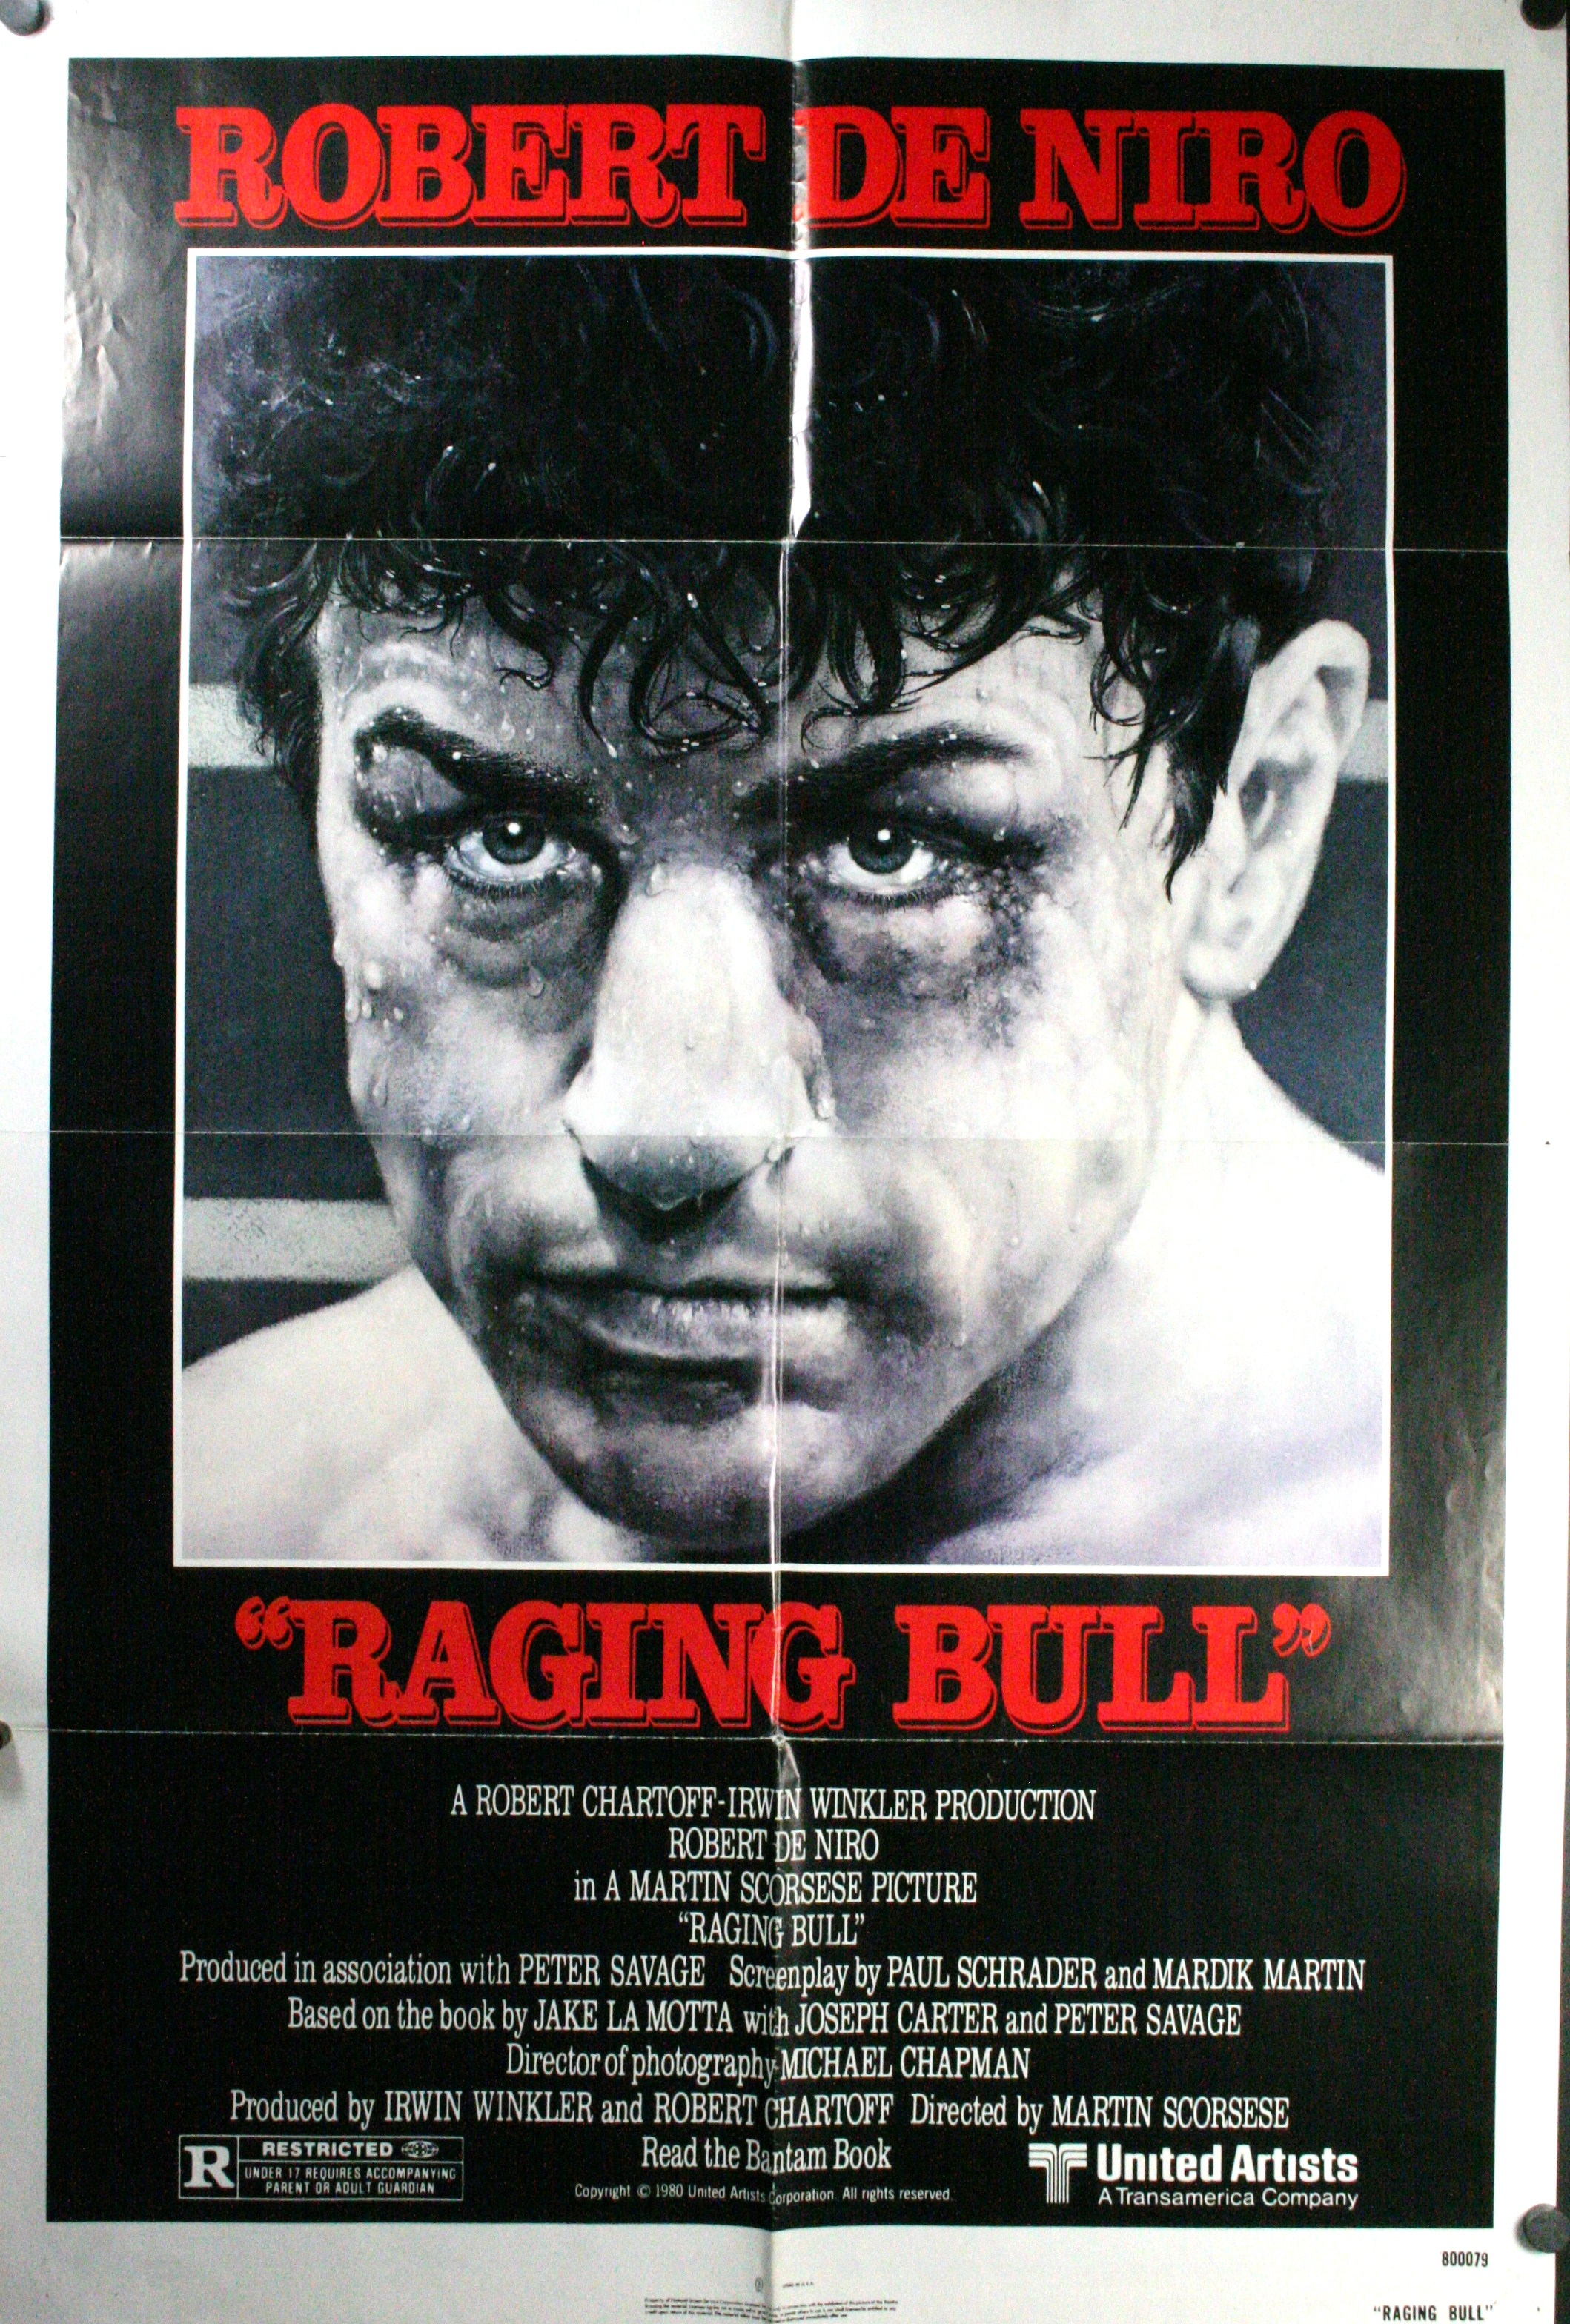 RAGING BULL, Original Vintage Movie Poster